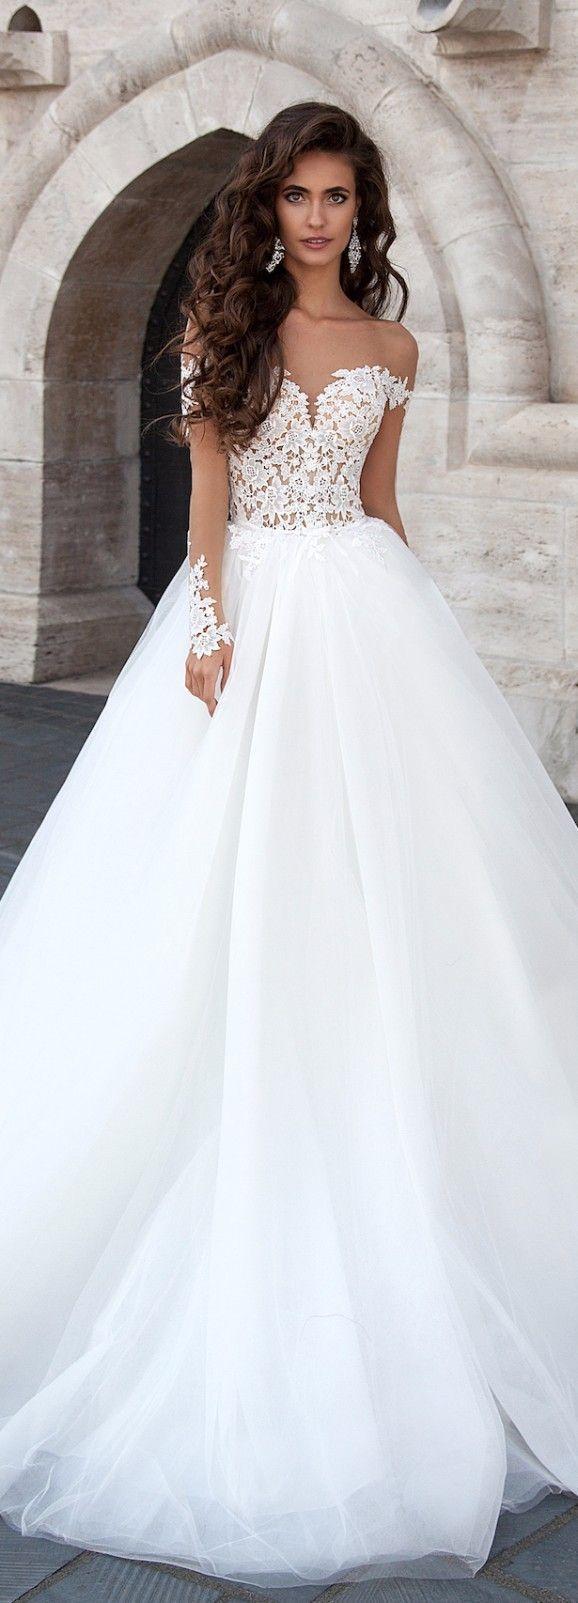 Os vestidos de noiva da marca Milla Nova   Blog Mariée